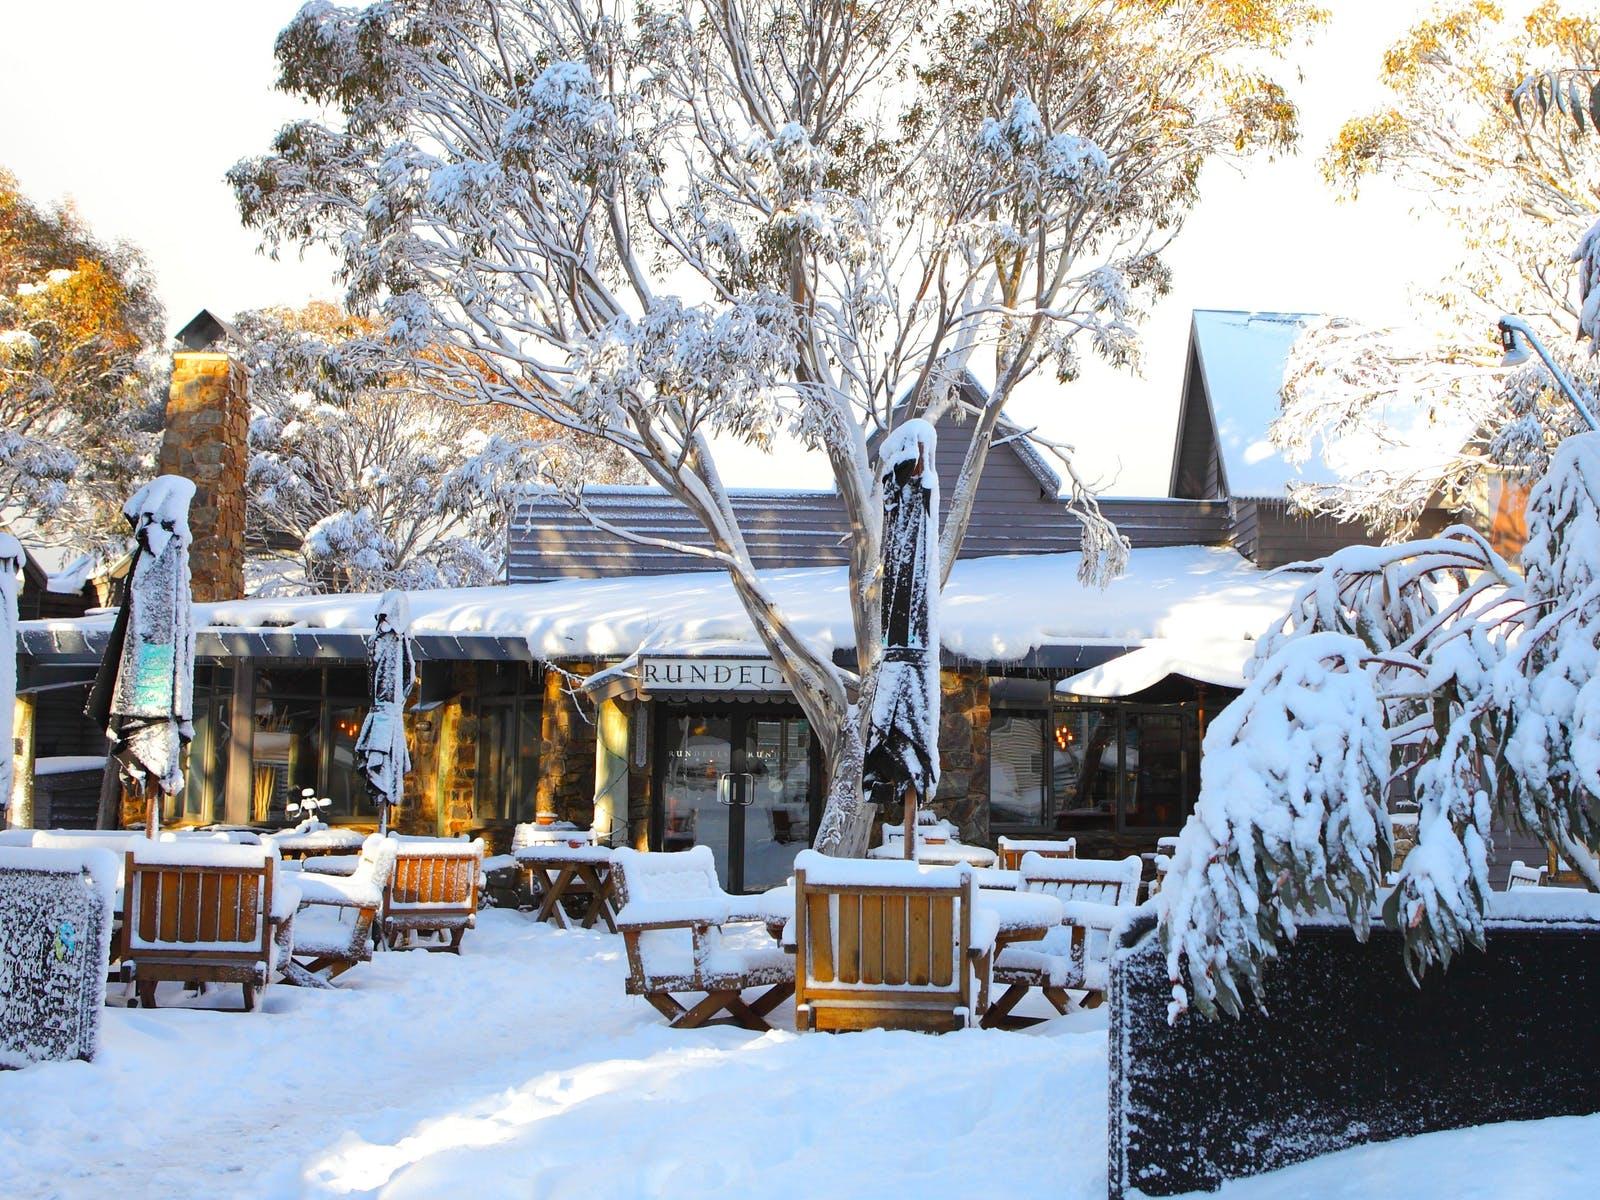 Rundells paddock in winter